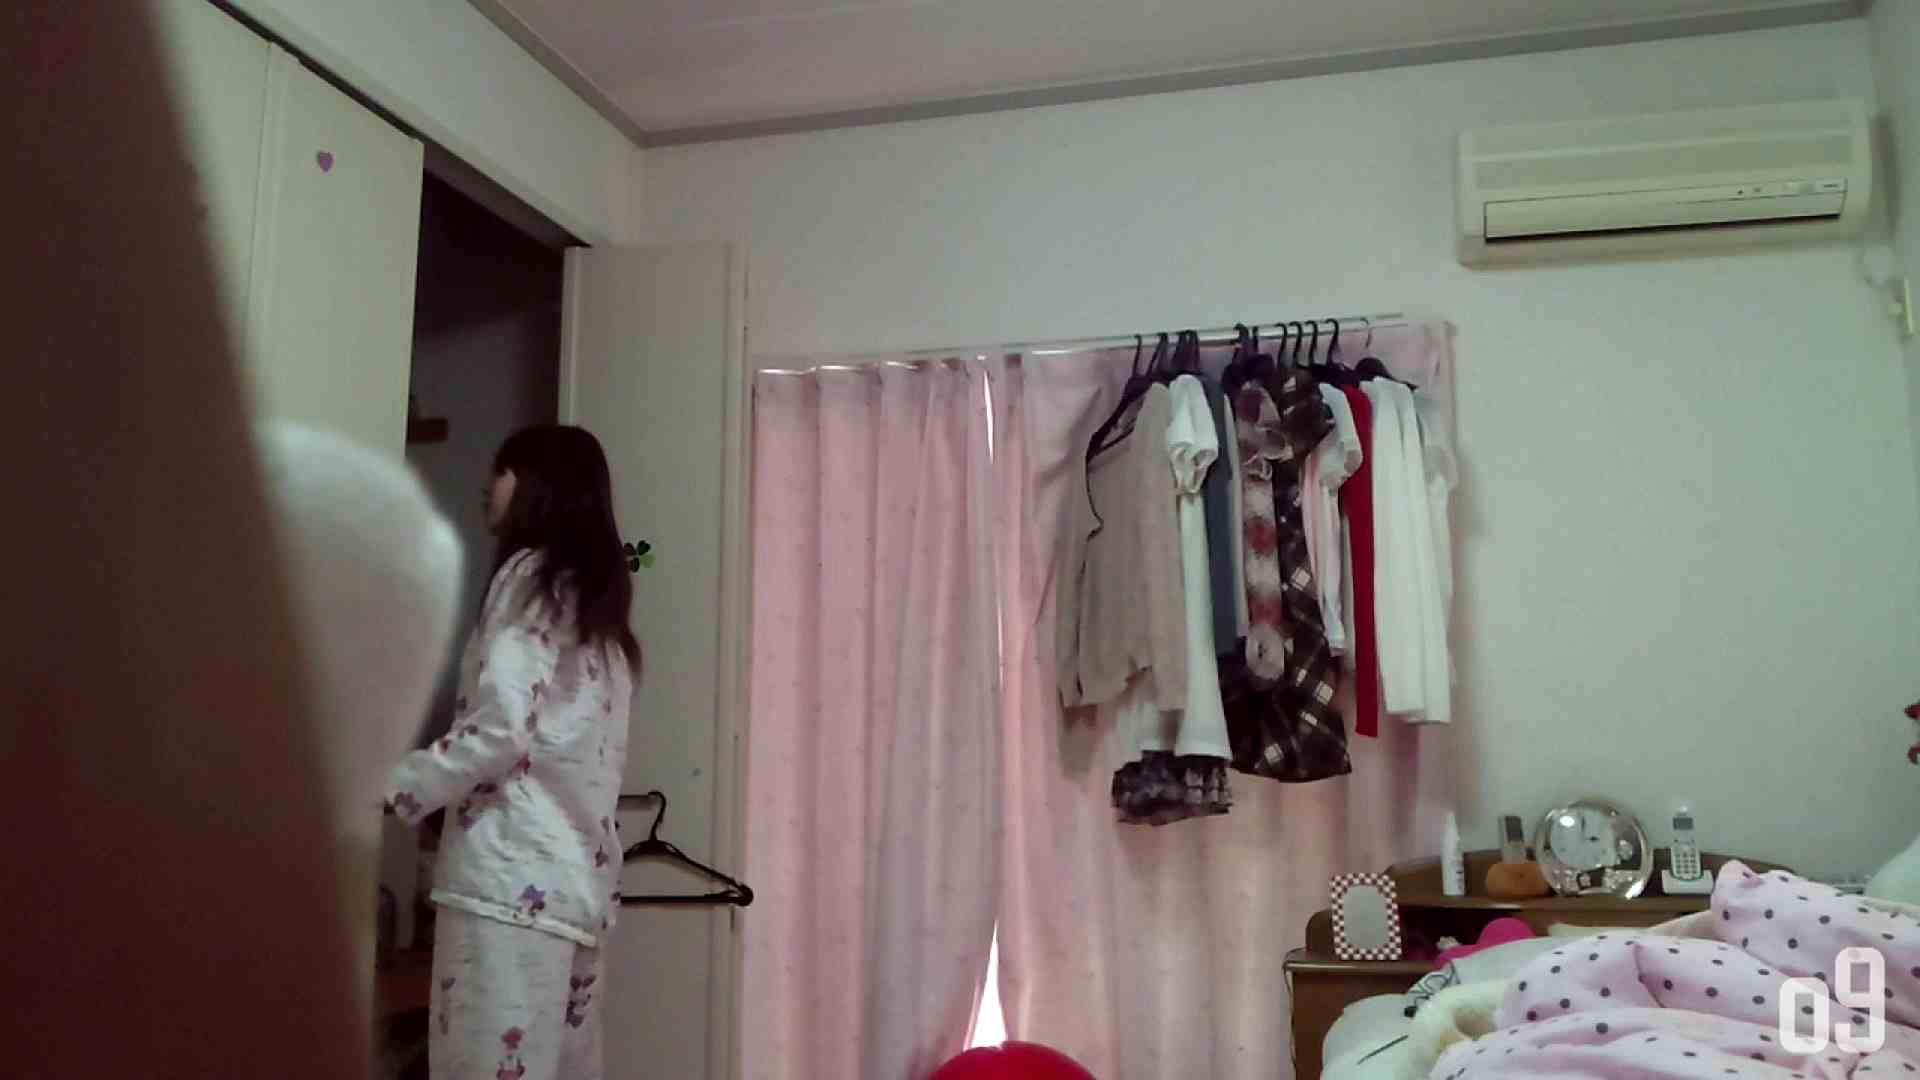 vol.2 瑞希ちゃんの自宅公開!寝起きの着替え・・・ラリルそー 着替え | エッチなOL  77pic 13